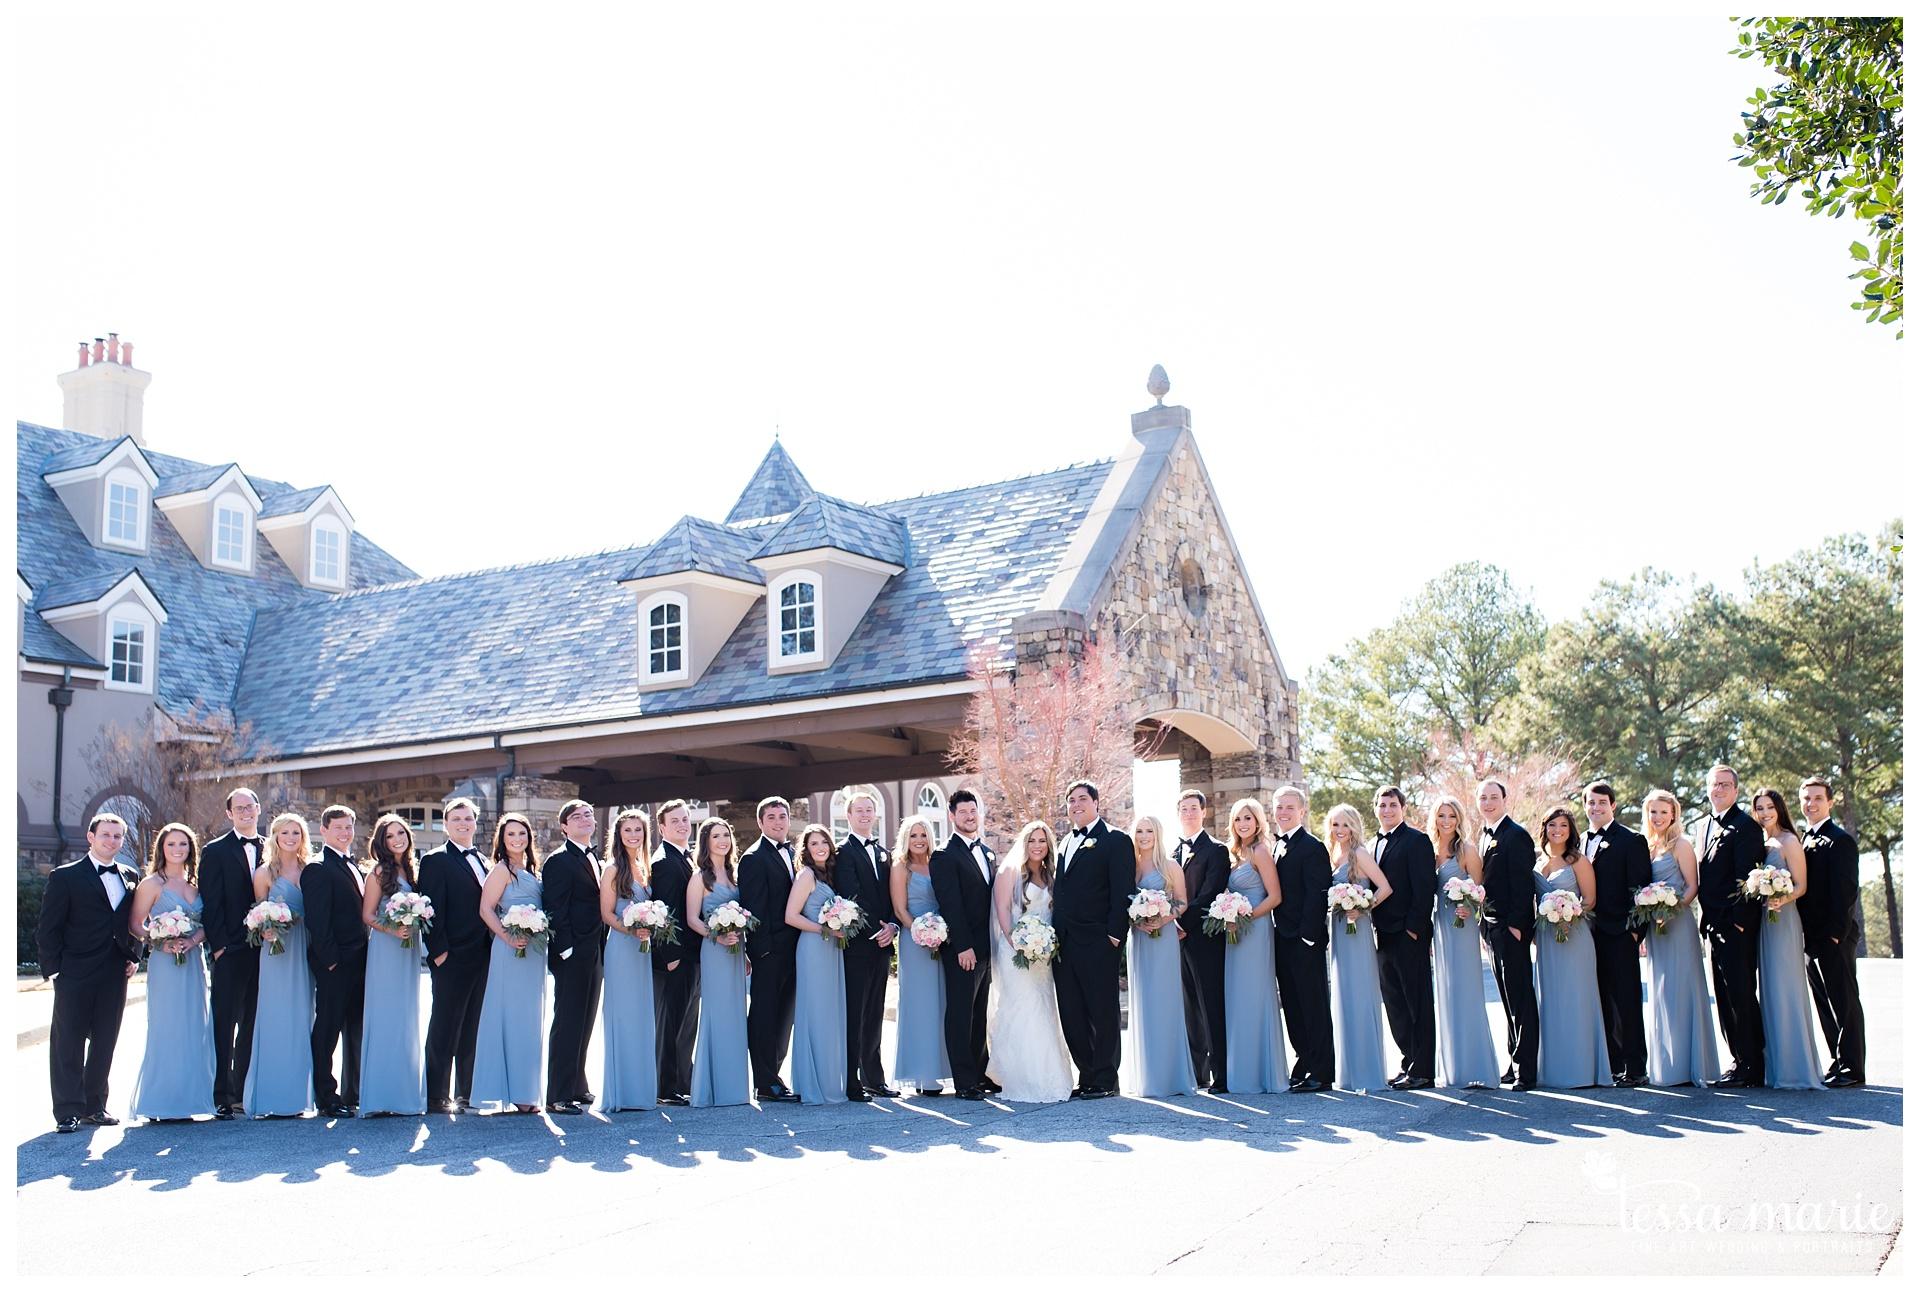 tessa_marie_weddings_legacy_story_focused_wedding_pictures_atlanta_wedding_photographer_0099